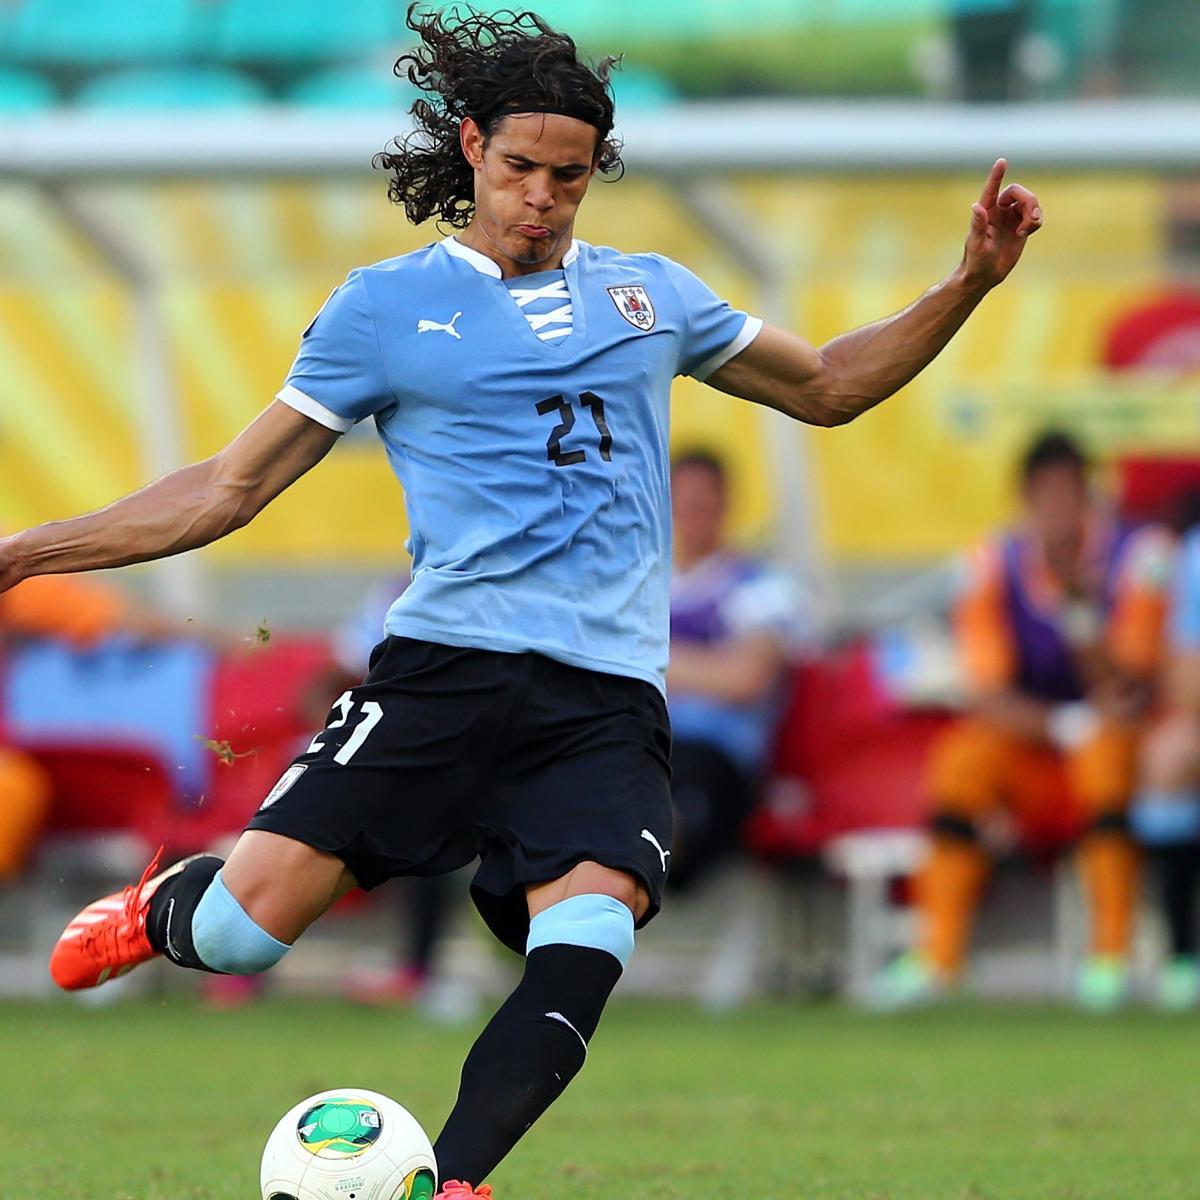 Psg Transfer News Latest On Lucas Moura Top Rumours: Picking A PSG Side To Best Utilise Edinson Cavani